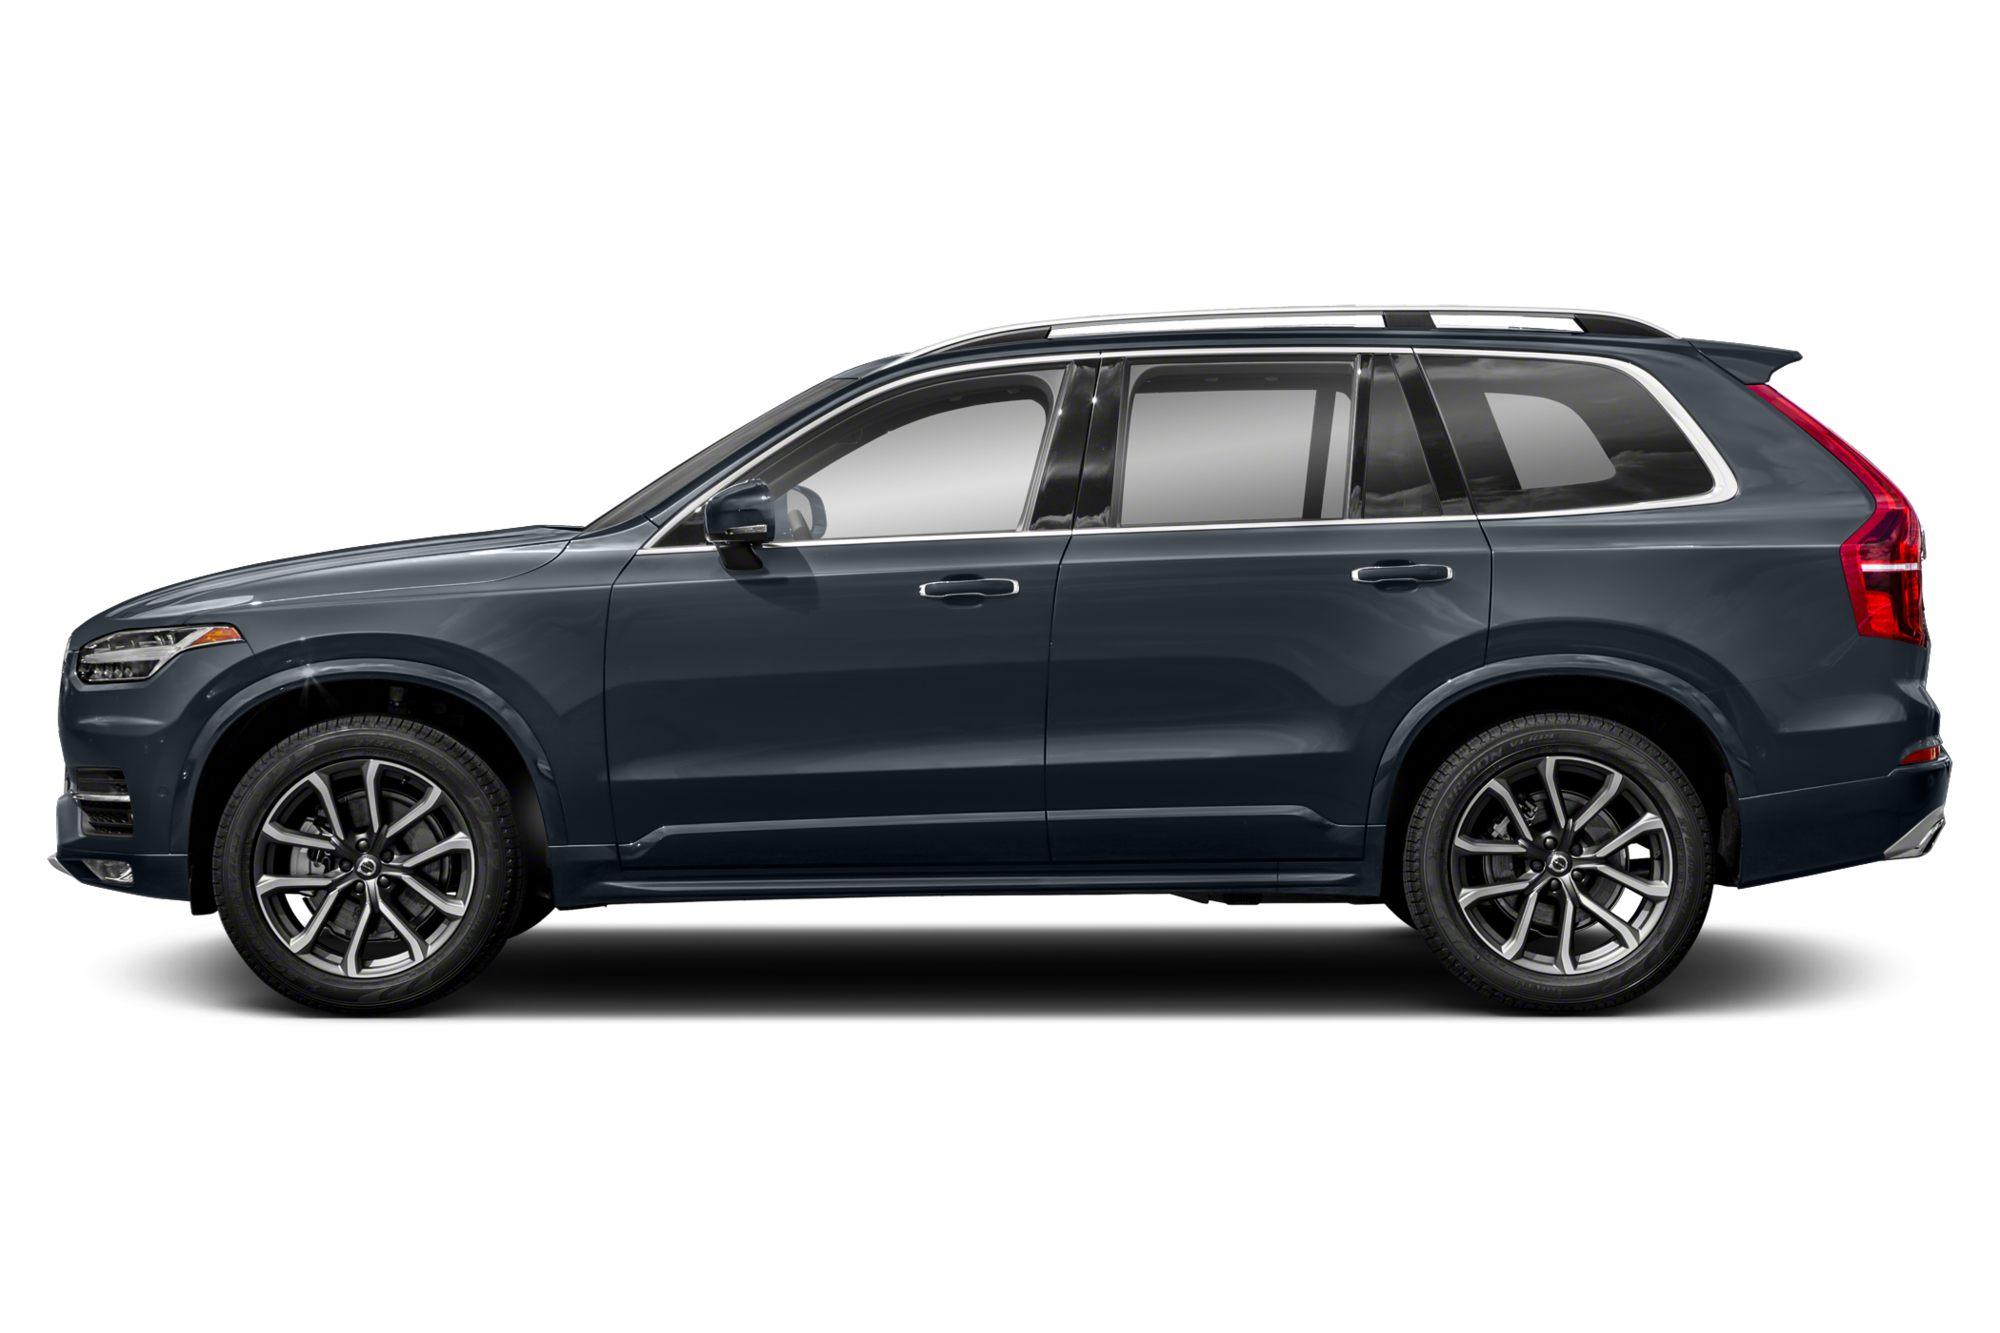 2019-2020 Volvo Cars, SUVs and Wagons: Recall Alert